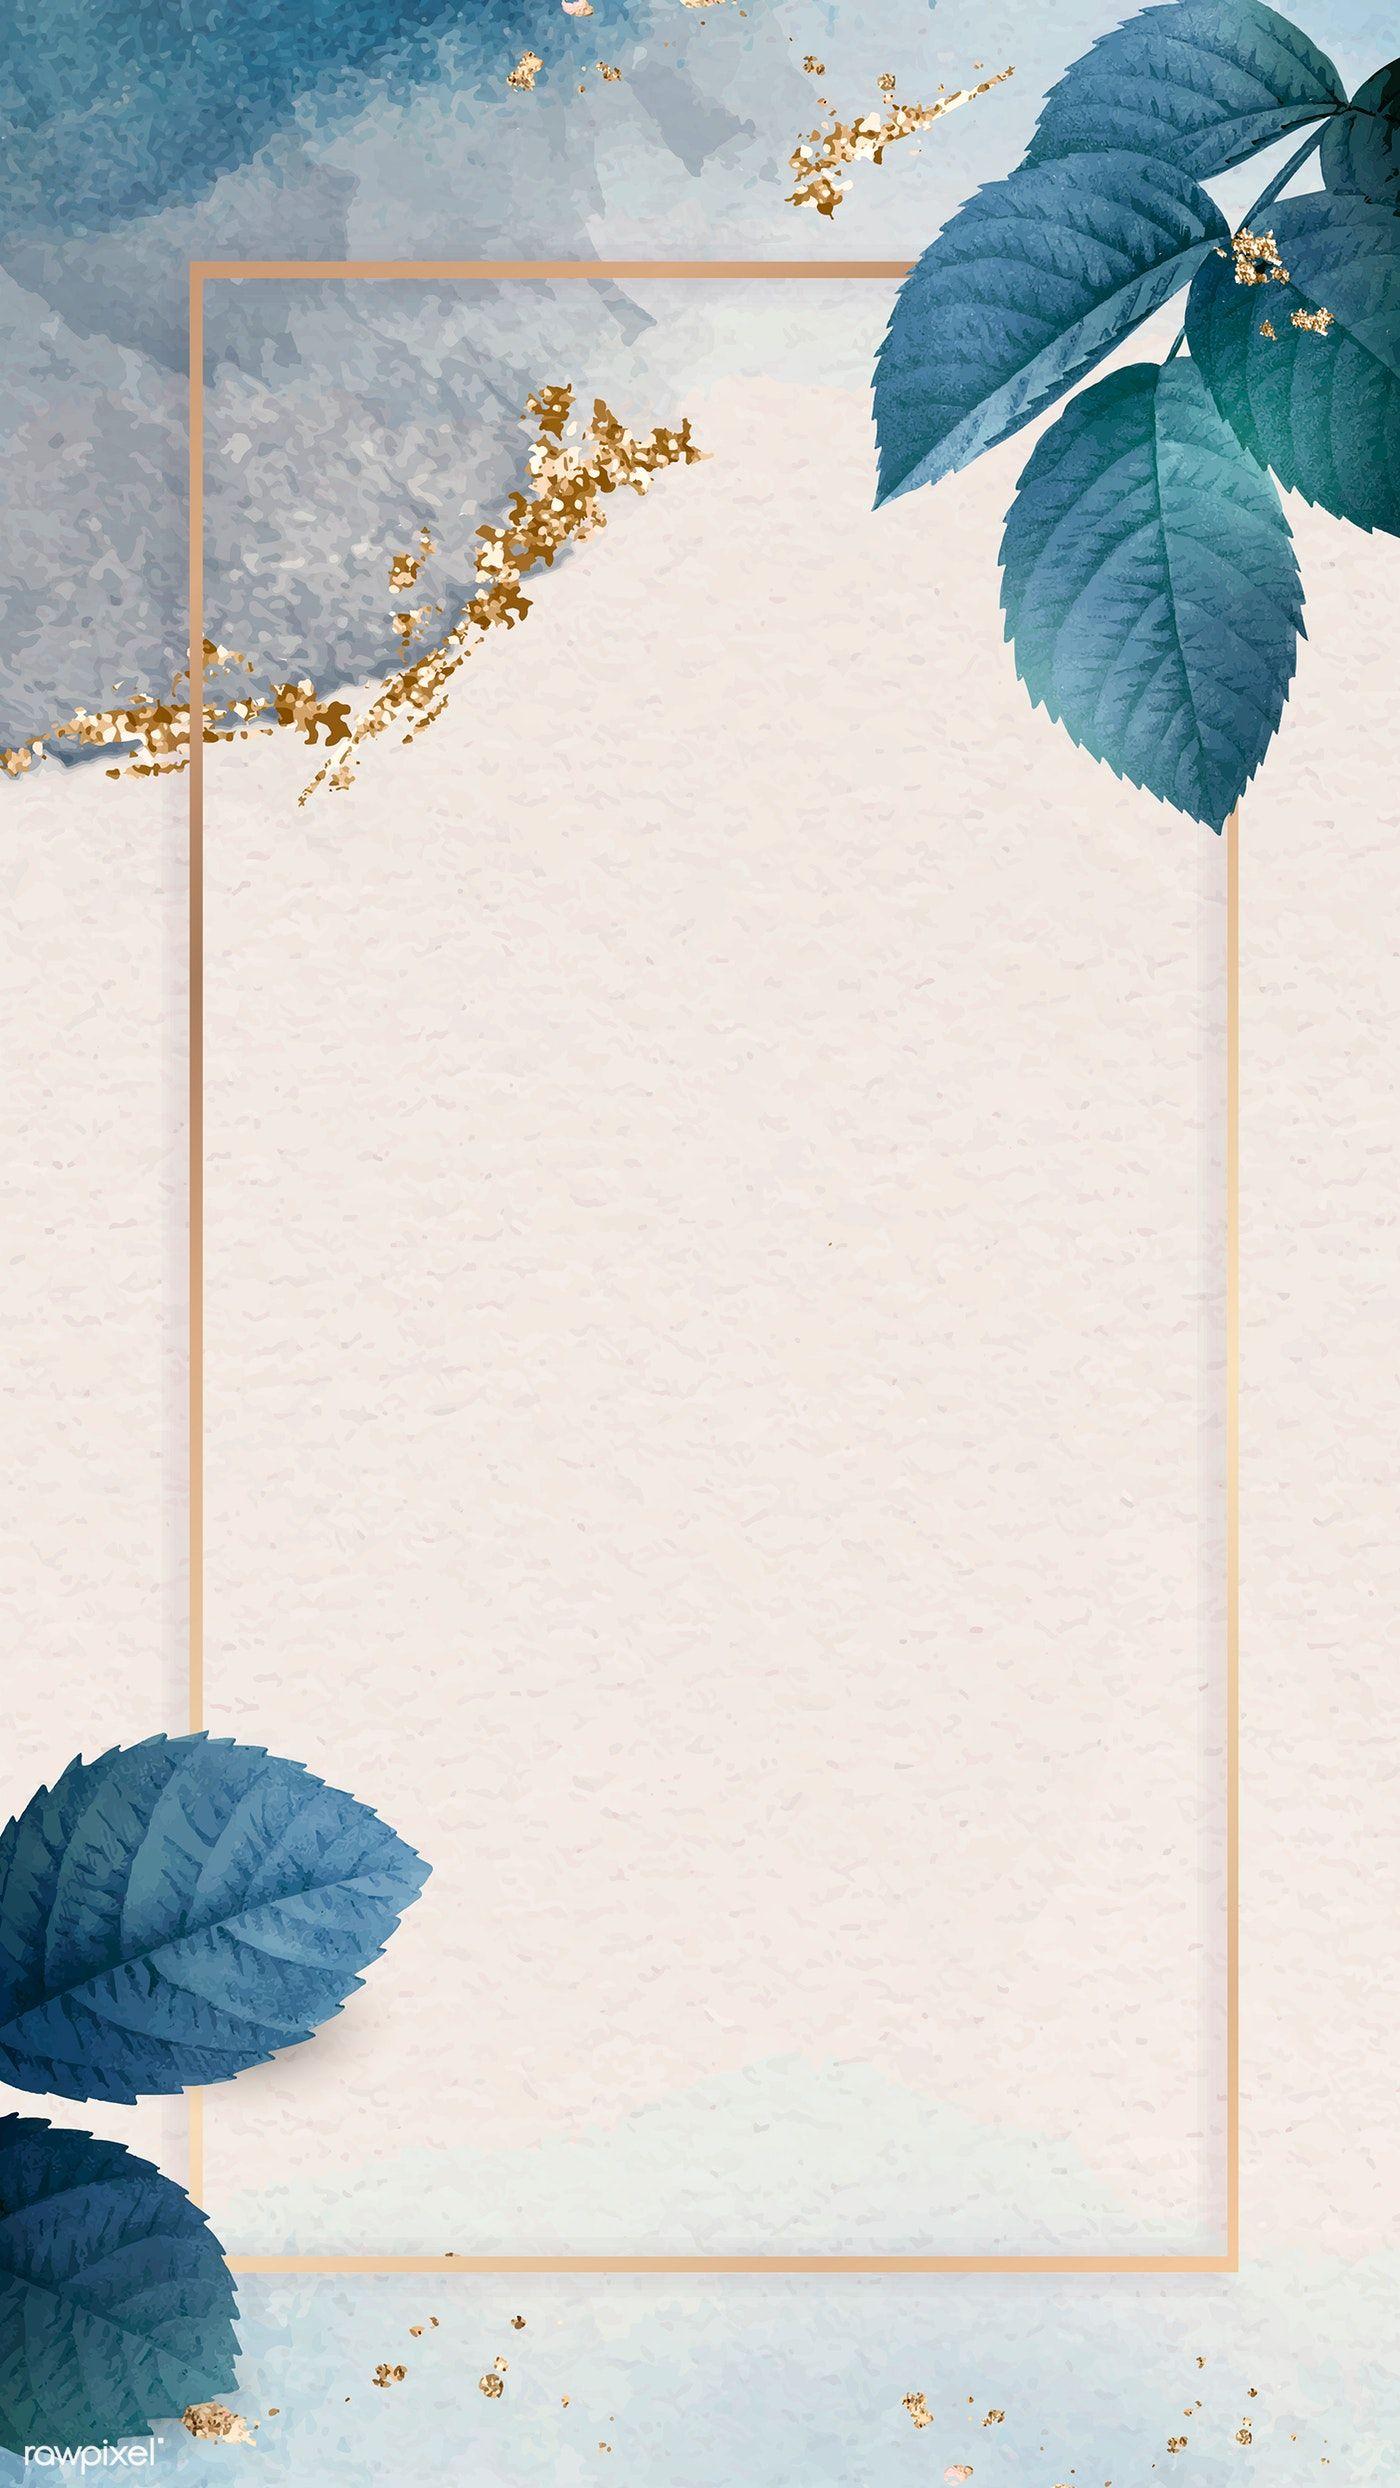 Gold Frame With Foliage Pattern Mobile Phone Wallpaper Vector Premium Image By Rawpixel Com Adj Cvetochnye Fony Fonovye Uzory Abstraktnoe